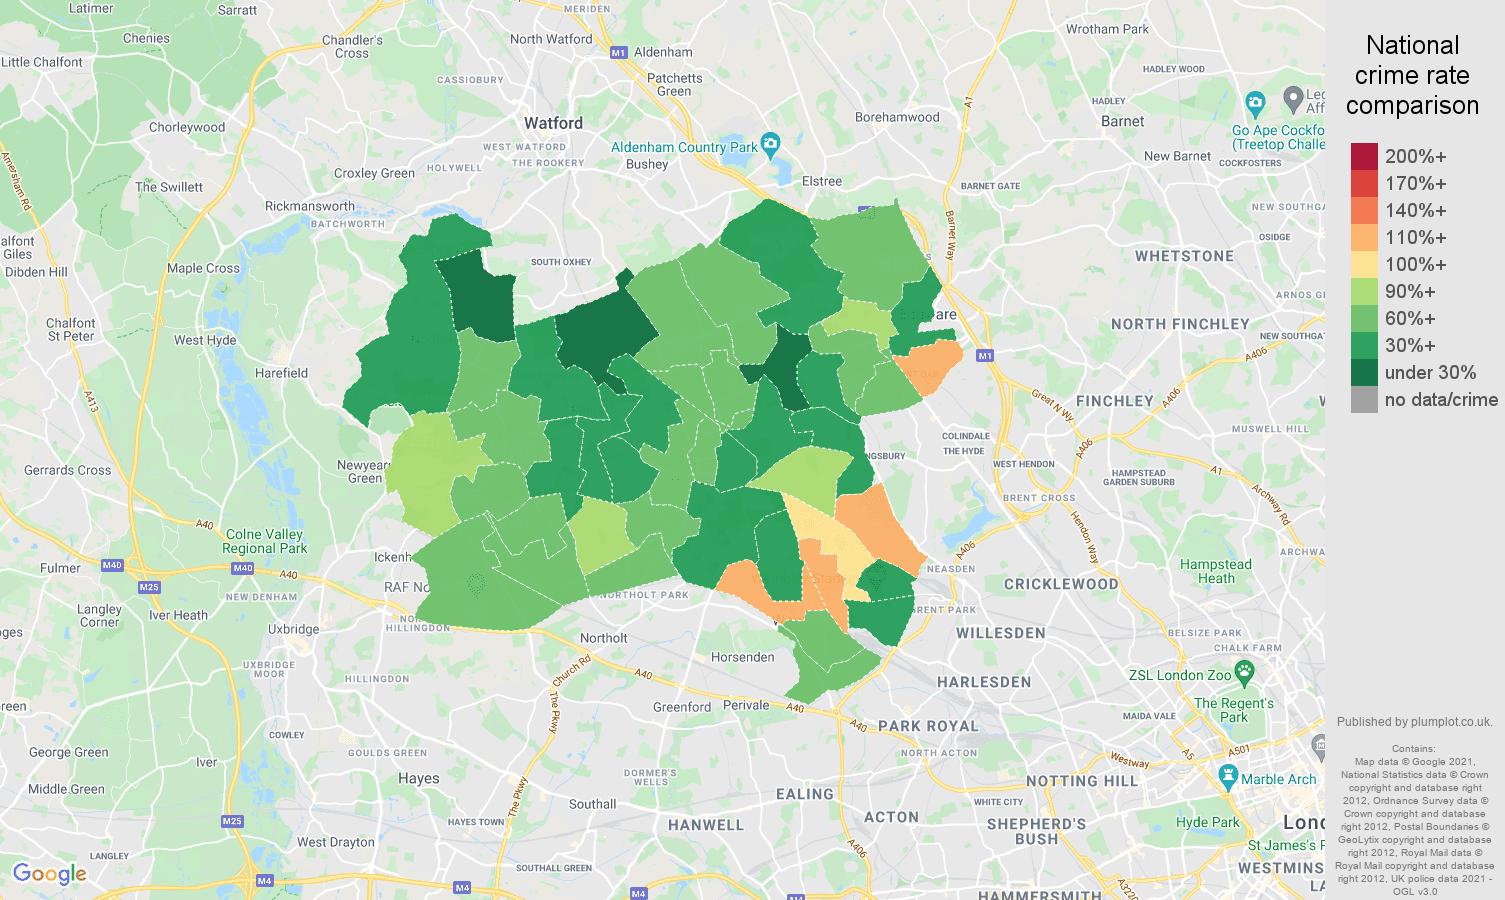 Harrow criminal damage and arson crime rate comparison map